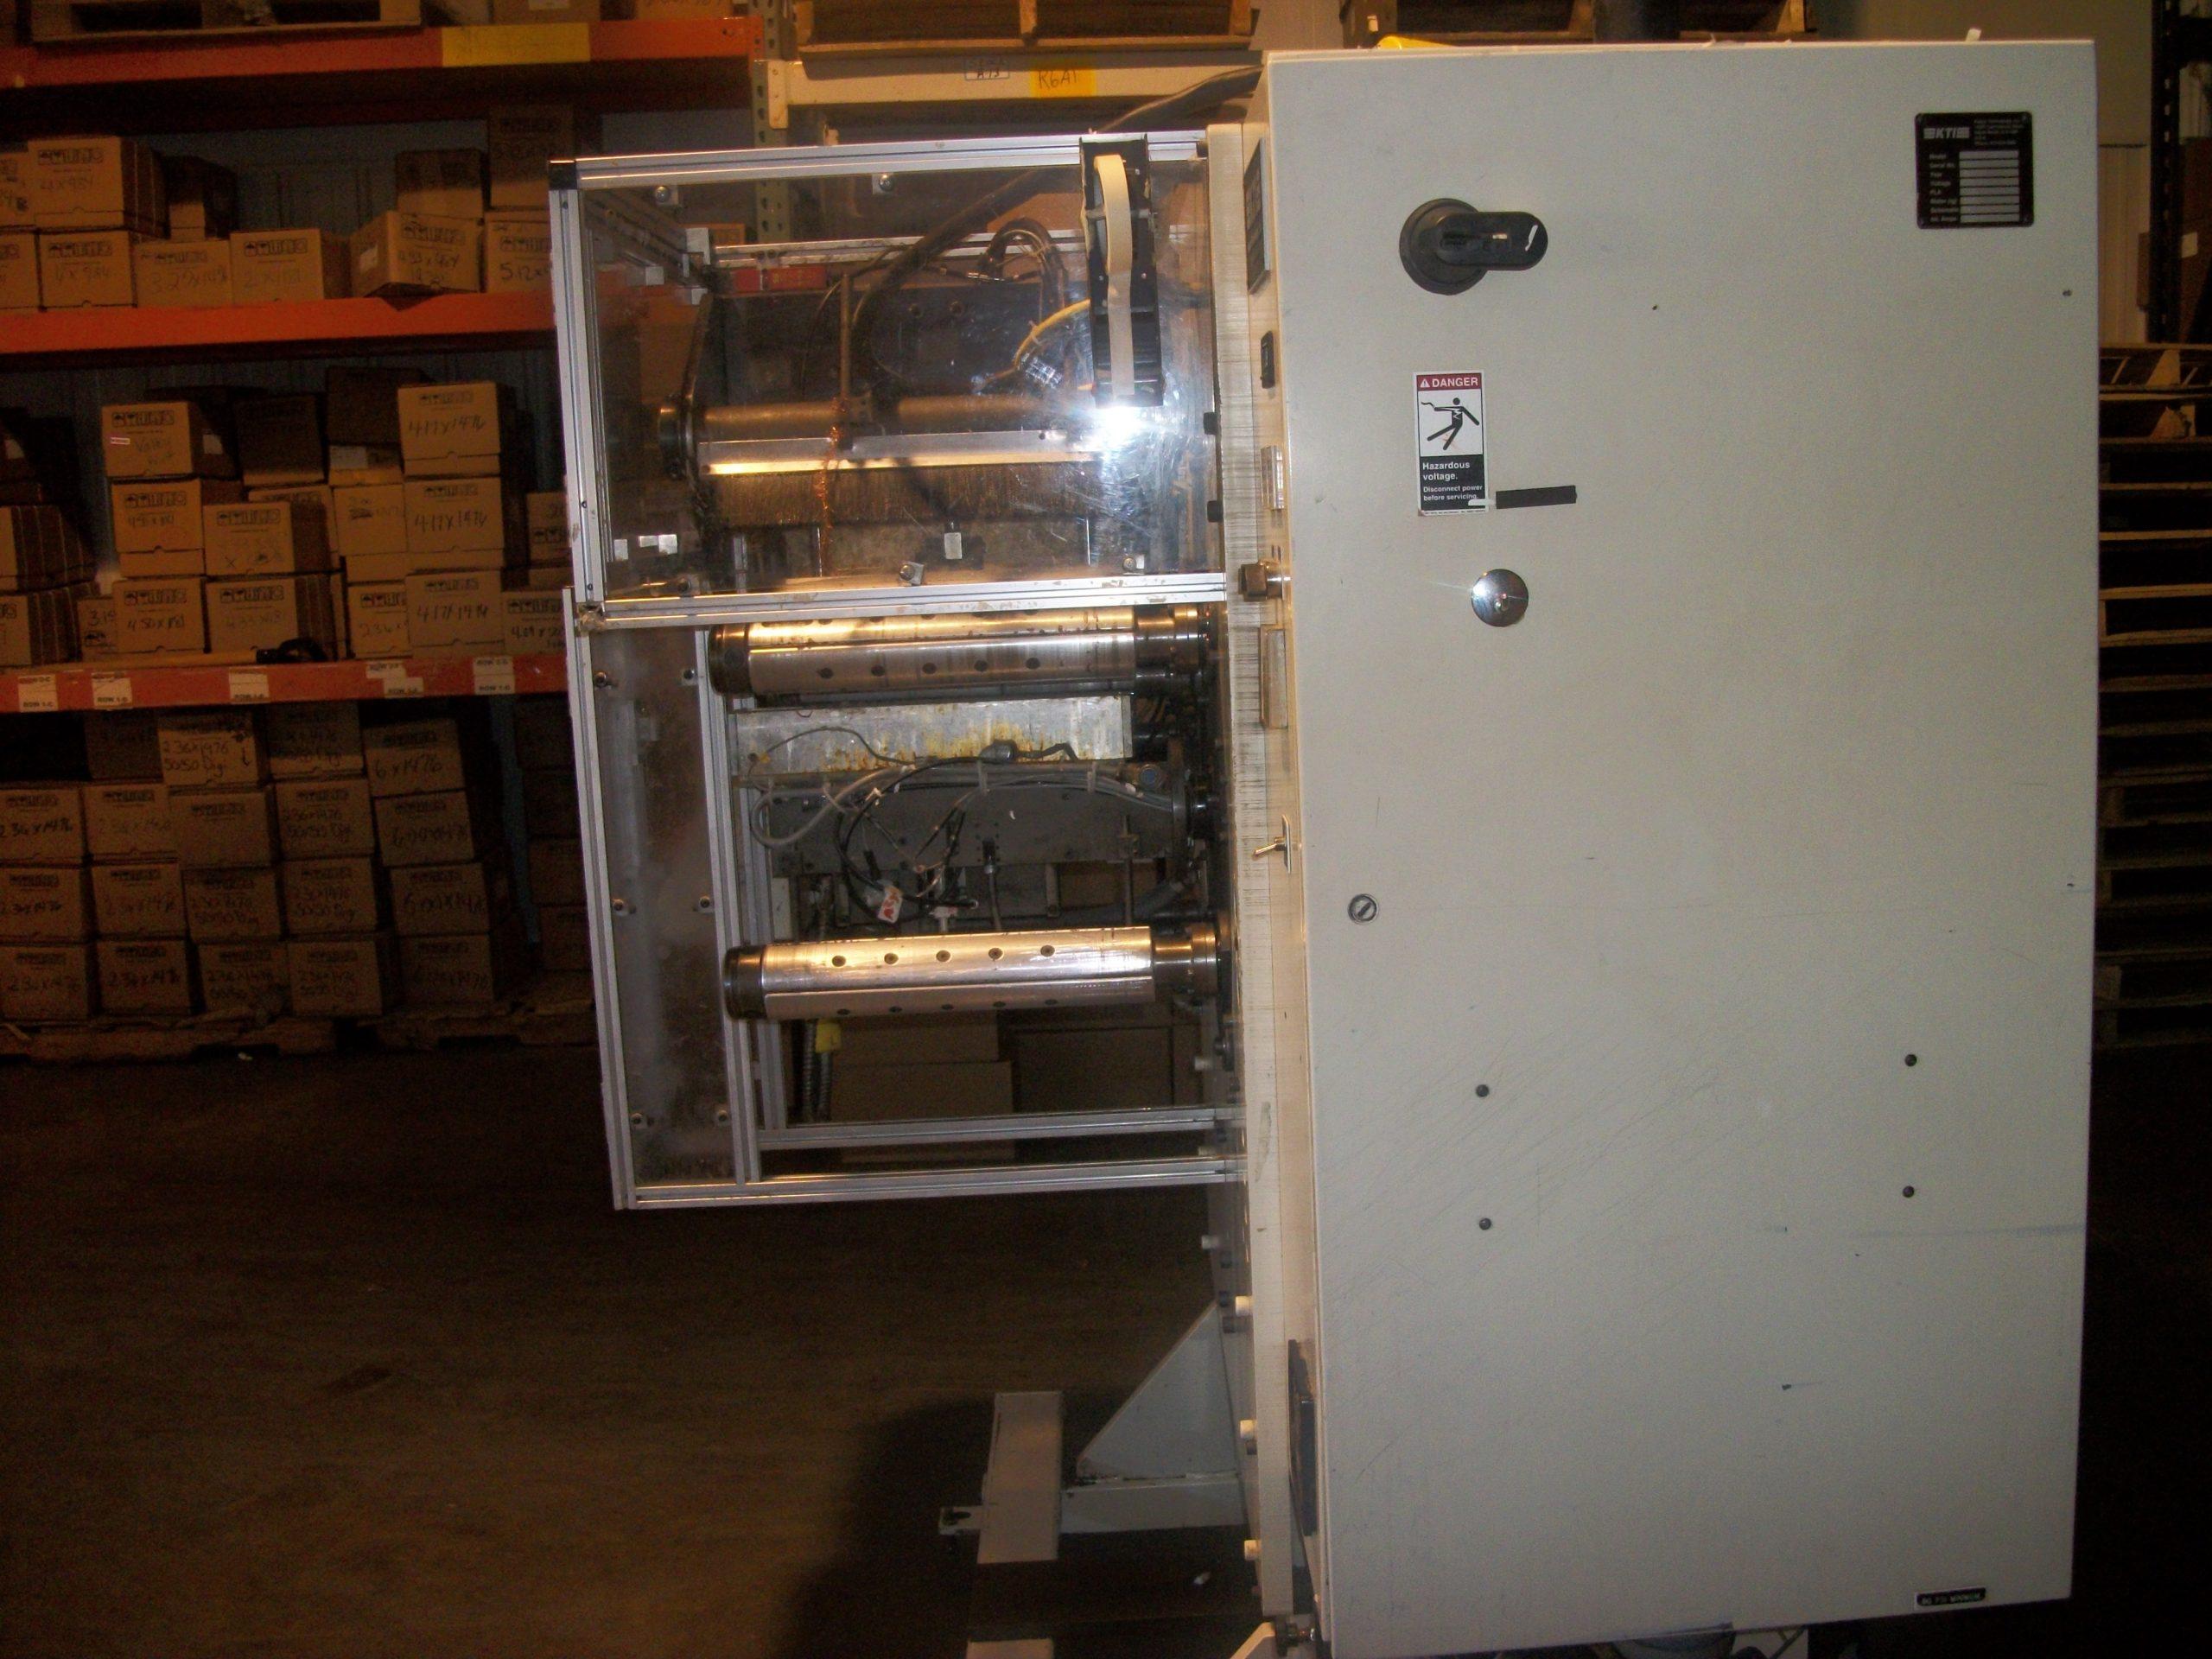 KTI JR1312 Turret Rewinder - Used Flexo Printing Presses and Used Flexographic Equipment-3